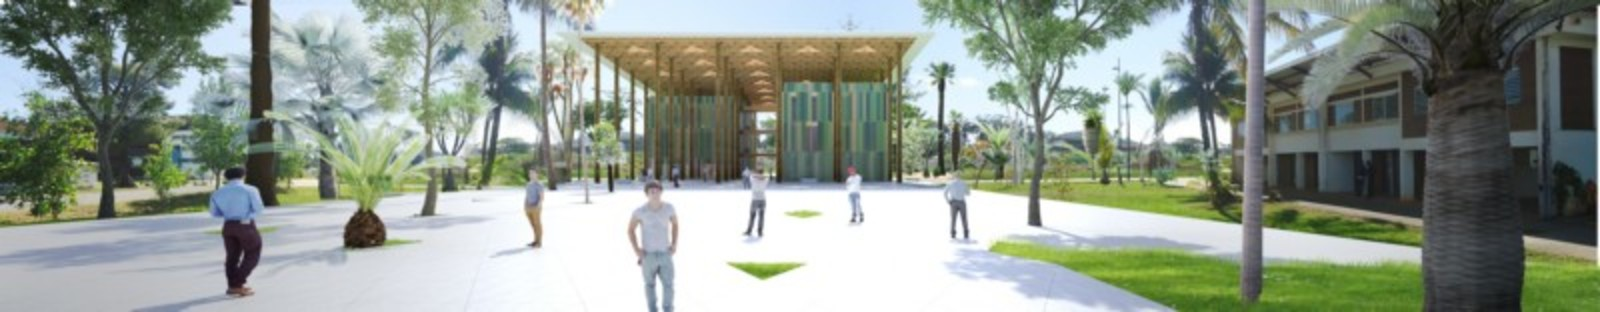 Cardete Huet Centro Administrativo Campus Universitario Cayena